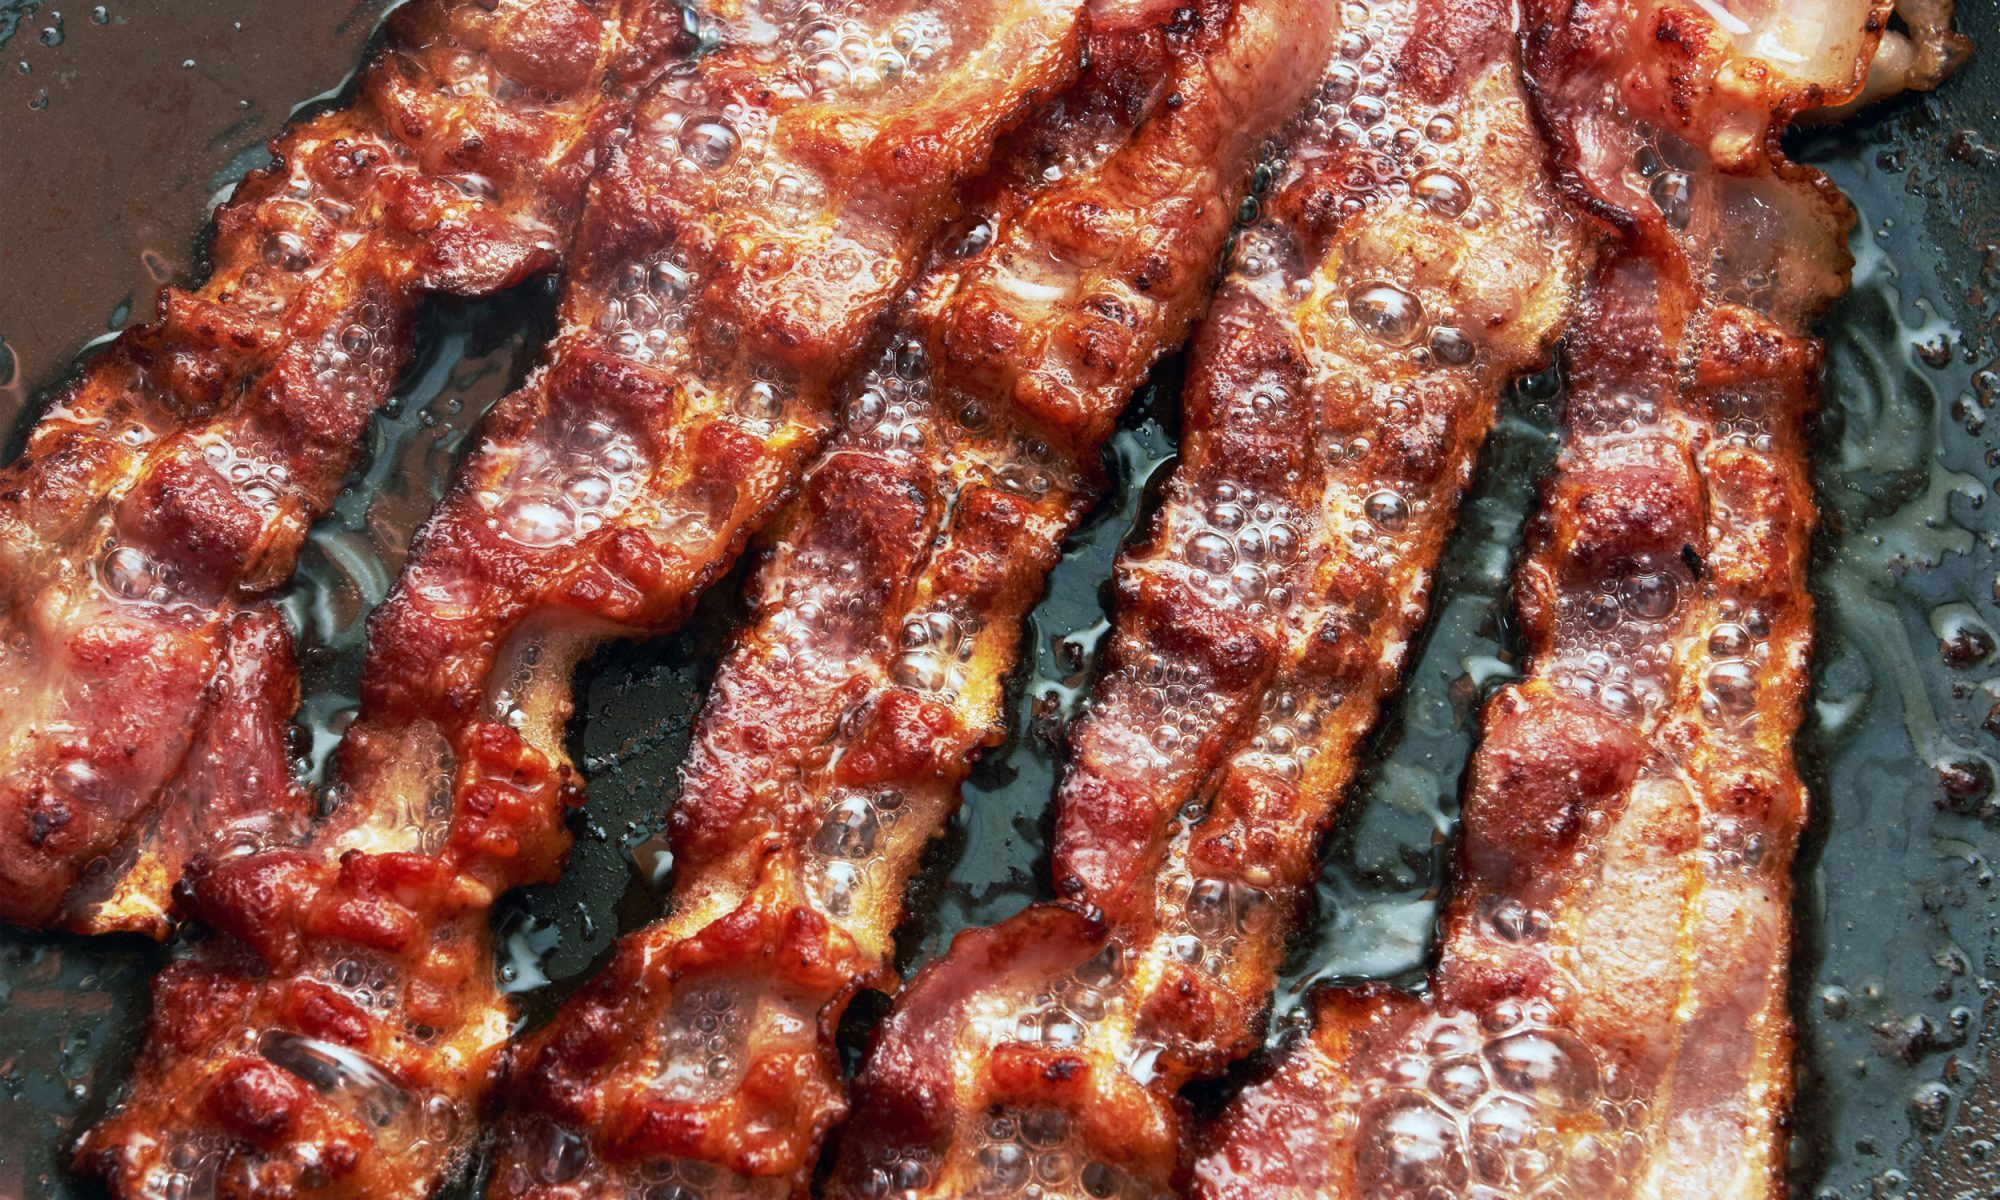 NAFTA Bacon